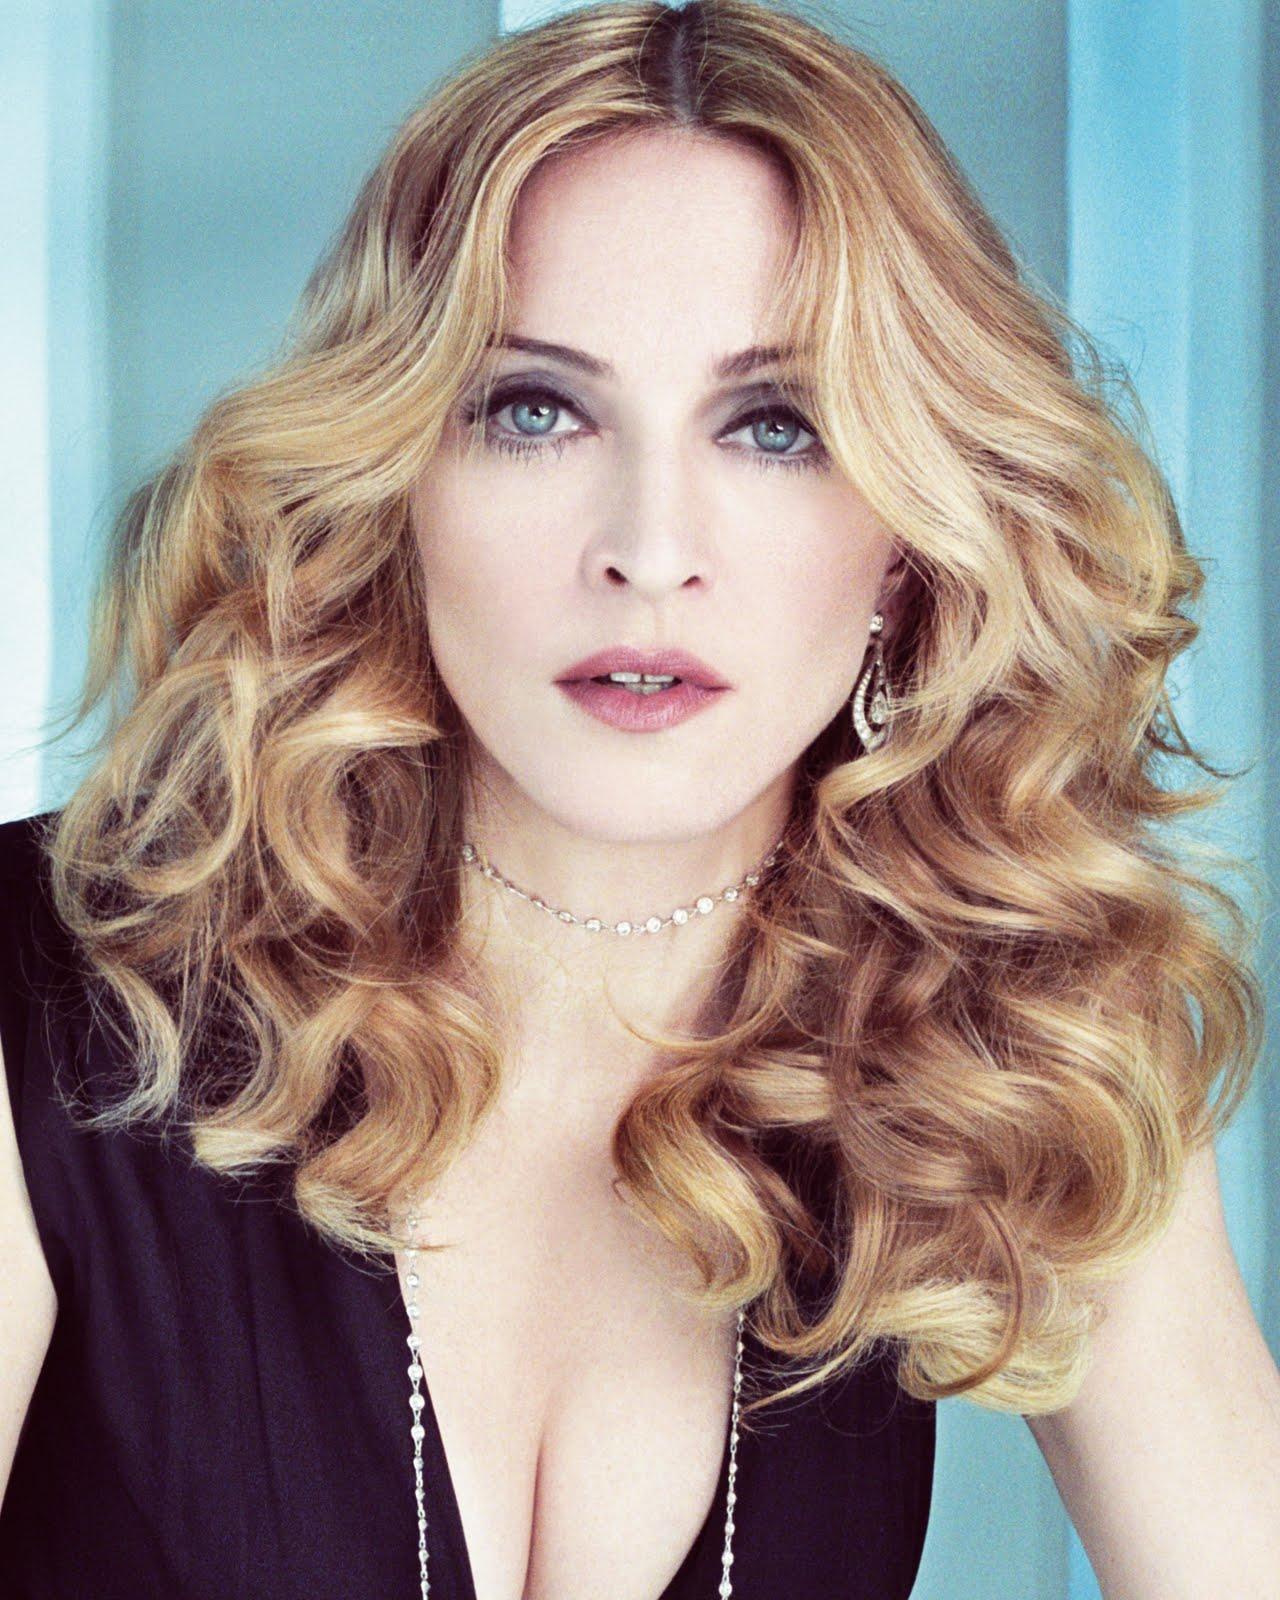 http://1.bp.blogspot.com/-qjrwfKPe6LY/UJcfMdSy0WI/AAAAAAAAEMk/z4Y65EVgRg4/s1600/Madonna2.jpg